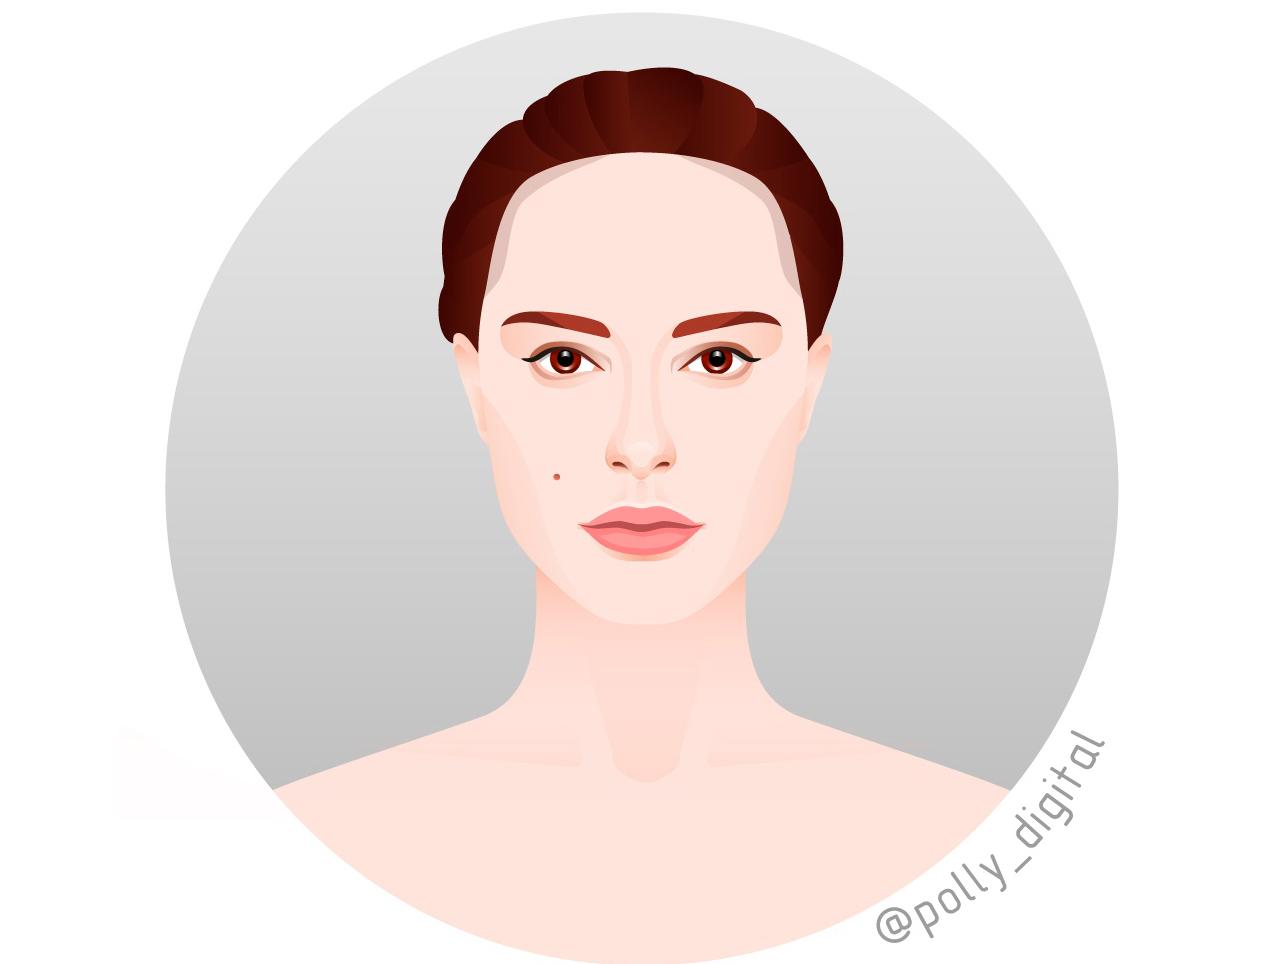 Portrait of Natalie Portman портрет web actor art artist digital vector vectorportrait illistration illustrator portait